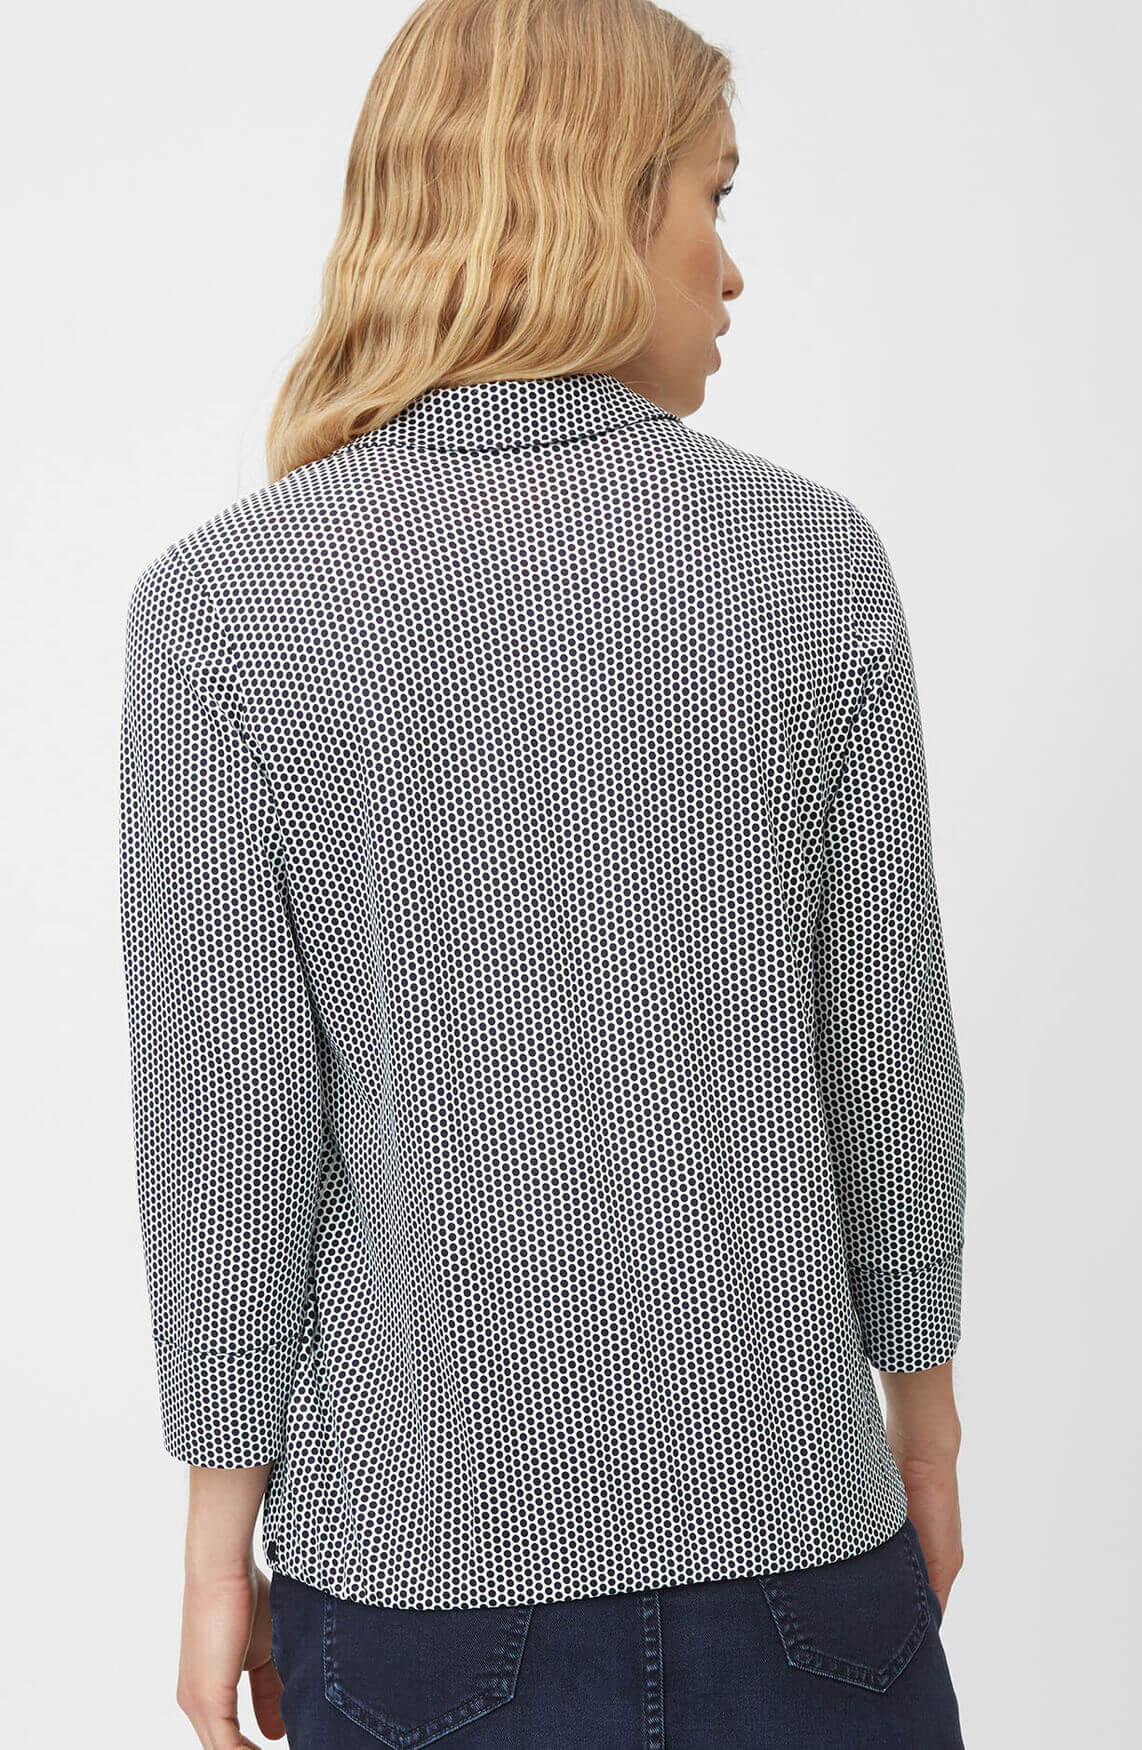 Marc O'Polo Dames Gestippelde blouse zwart